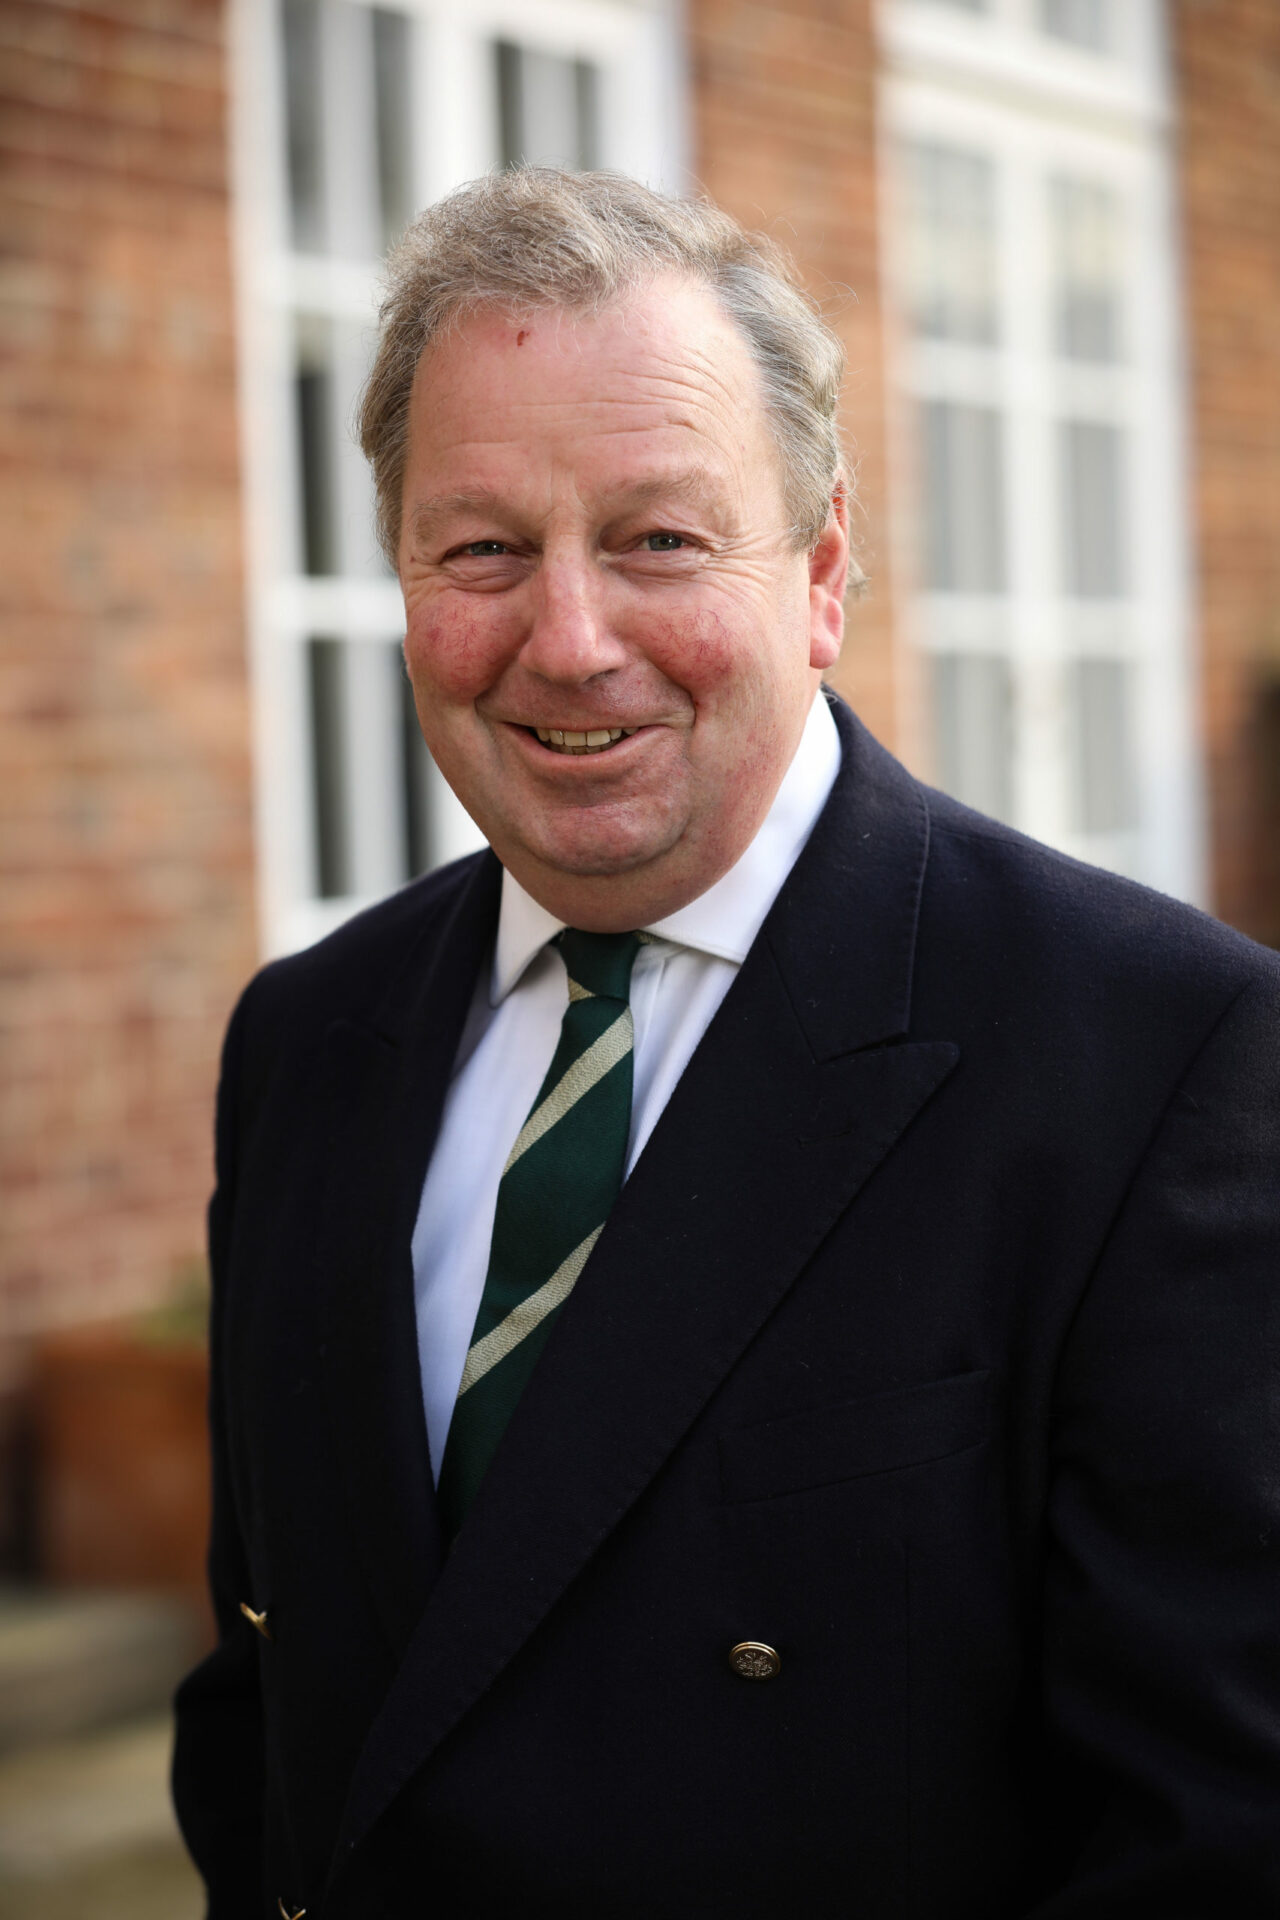 Danny Kinahan, Veterans Commissioner for Northern Ireland